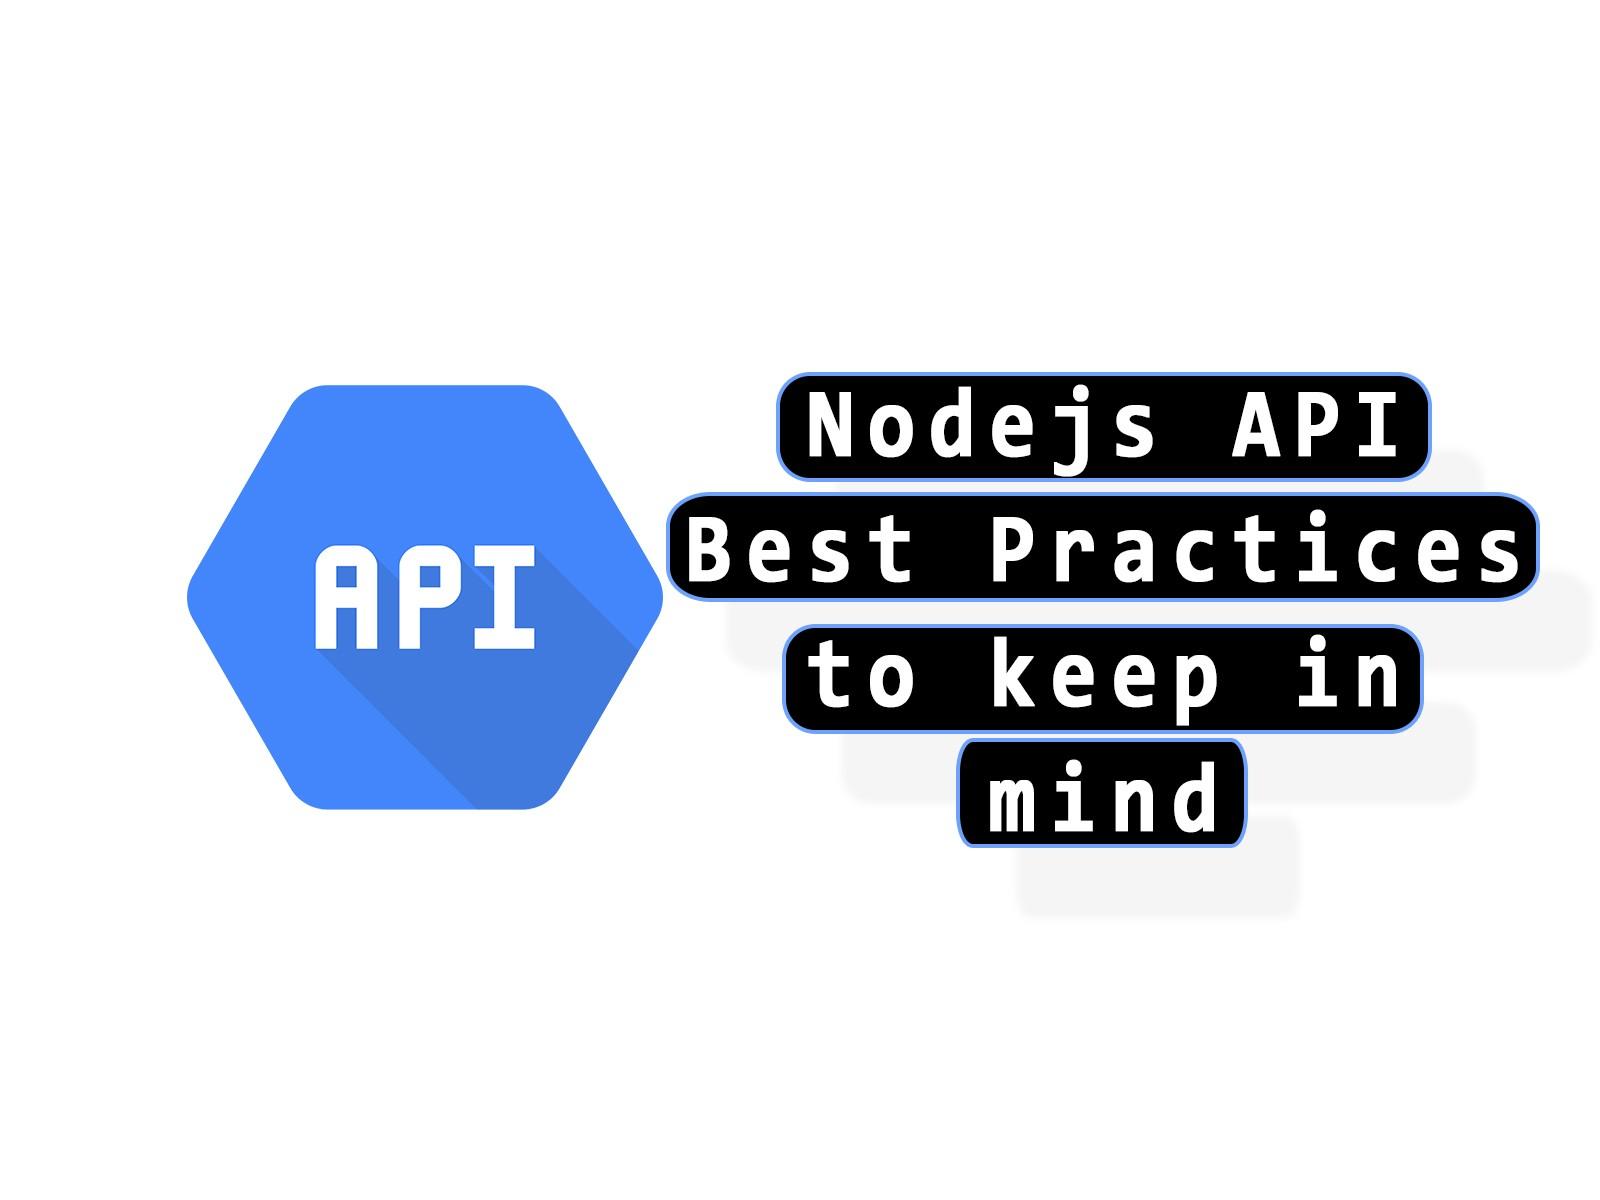 nodejs api best practices thumbnail